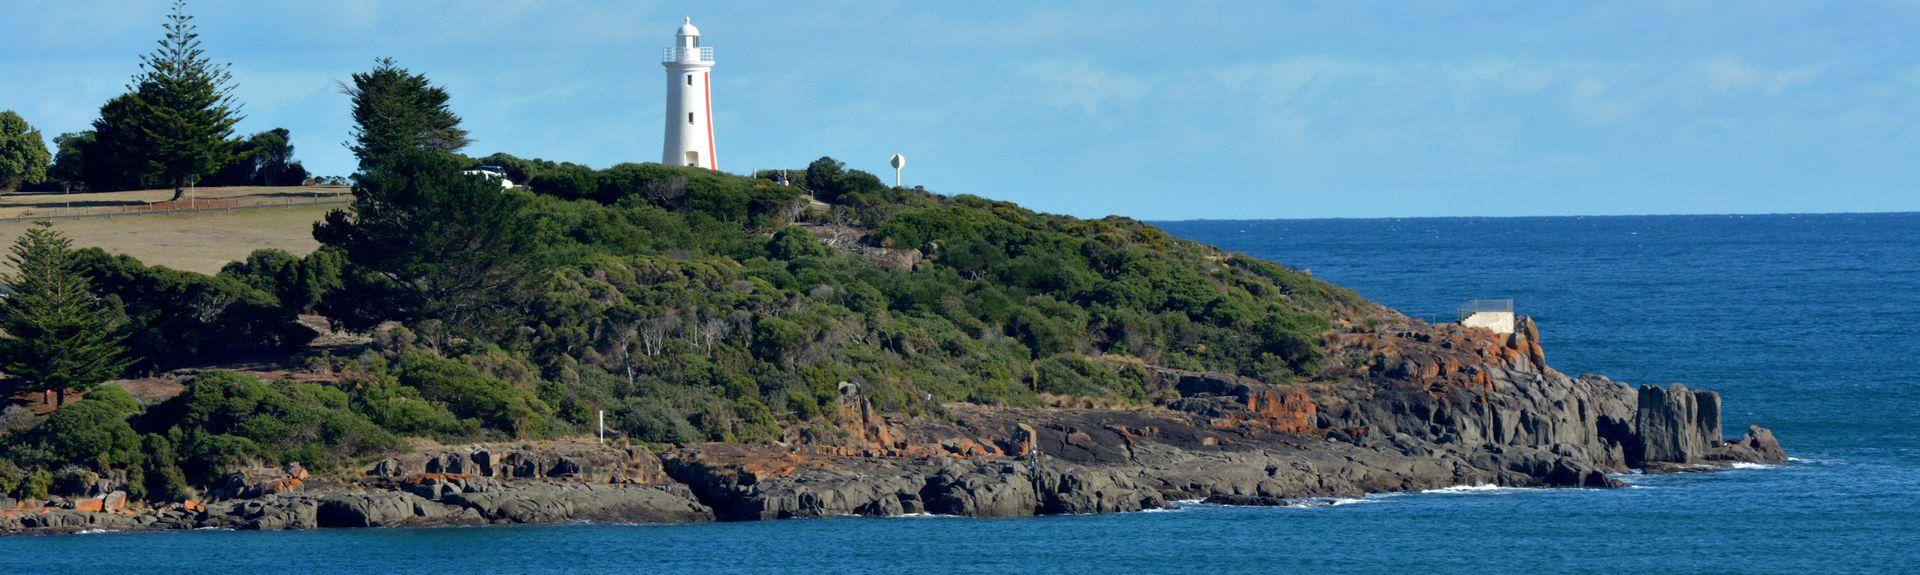 Devonport TAS, Australia